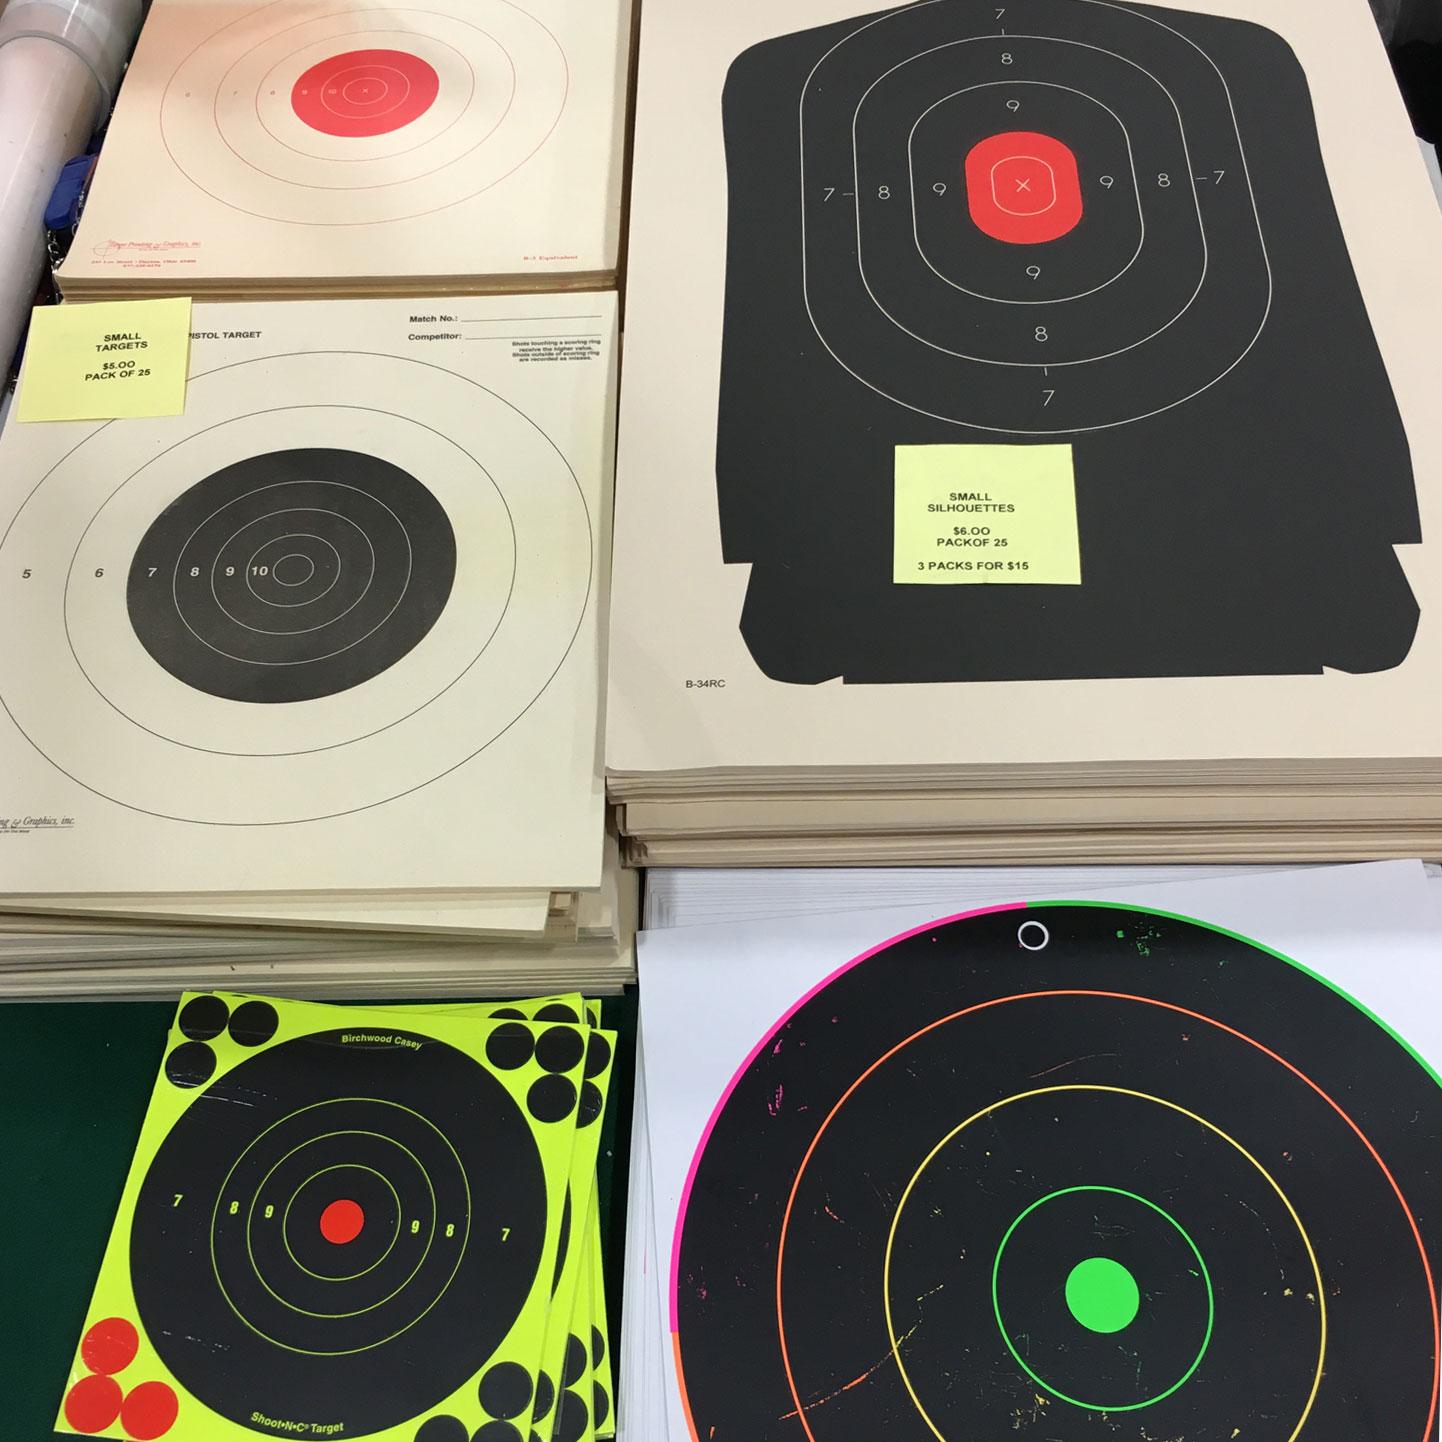 Nations Gun Show, Shooting Range Targets